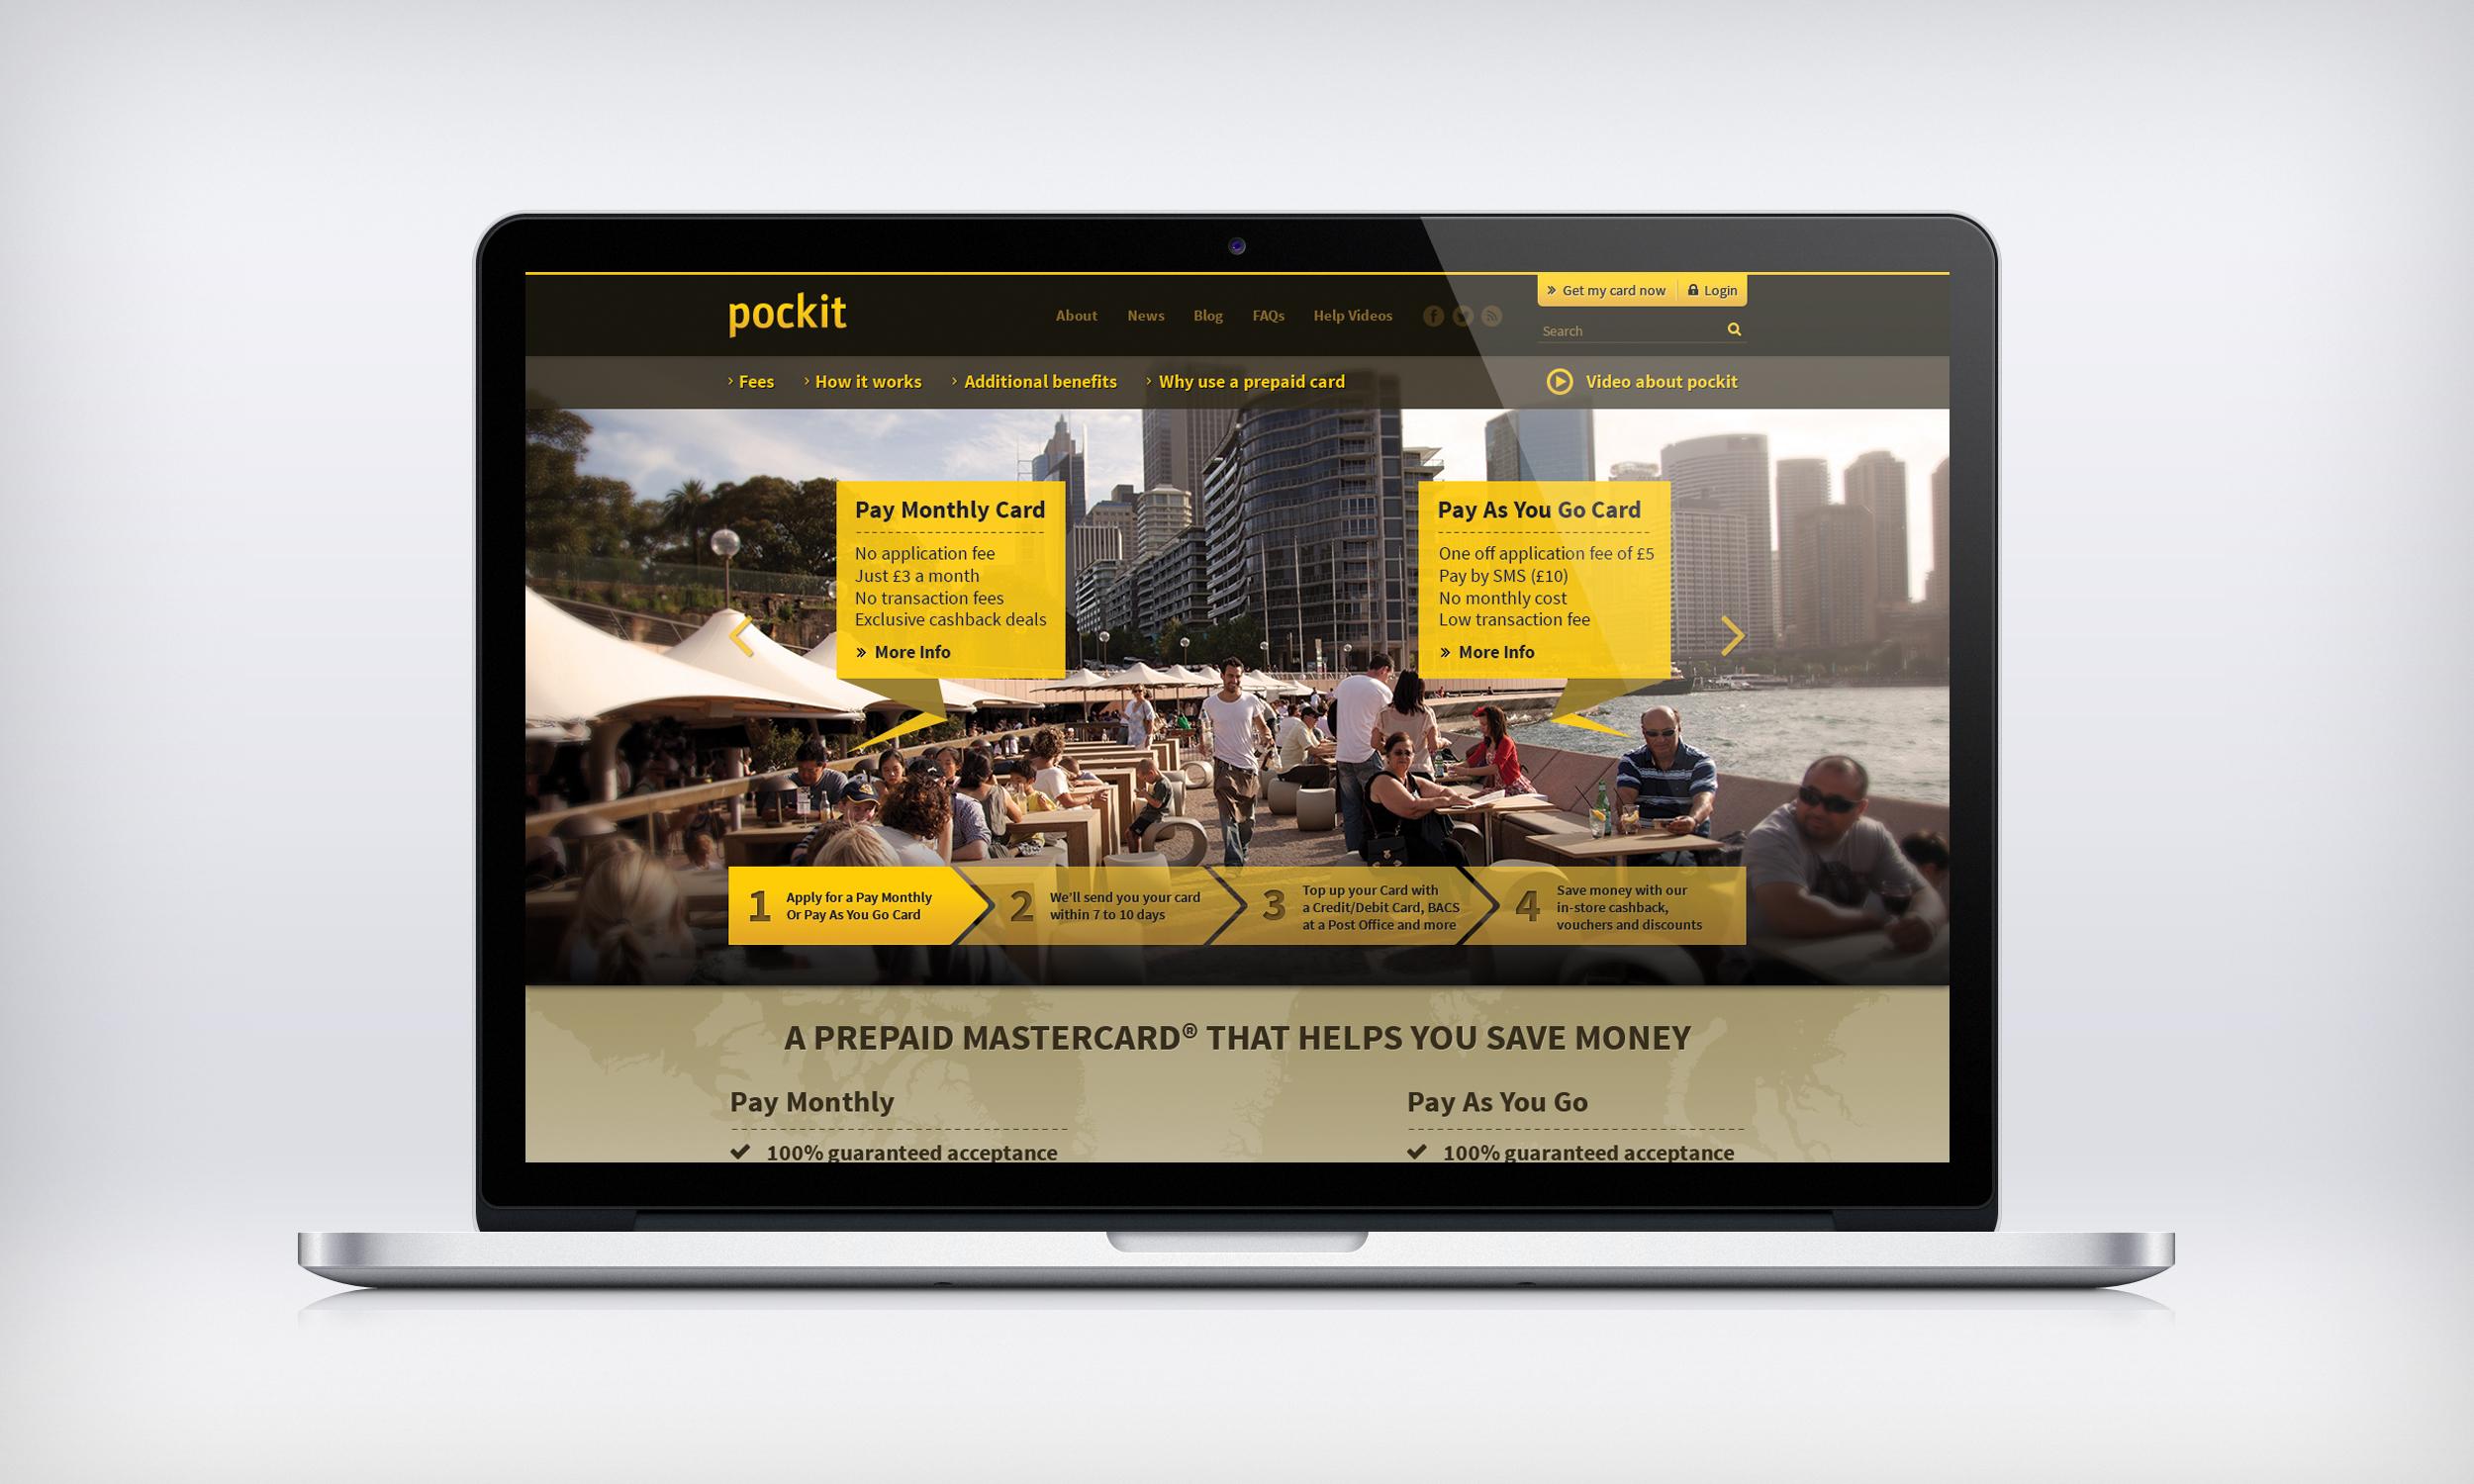 pockit_macbook_pro_view